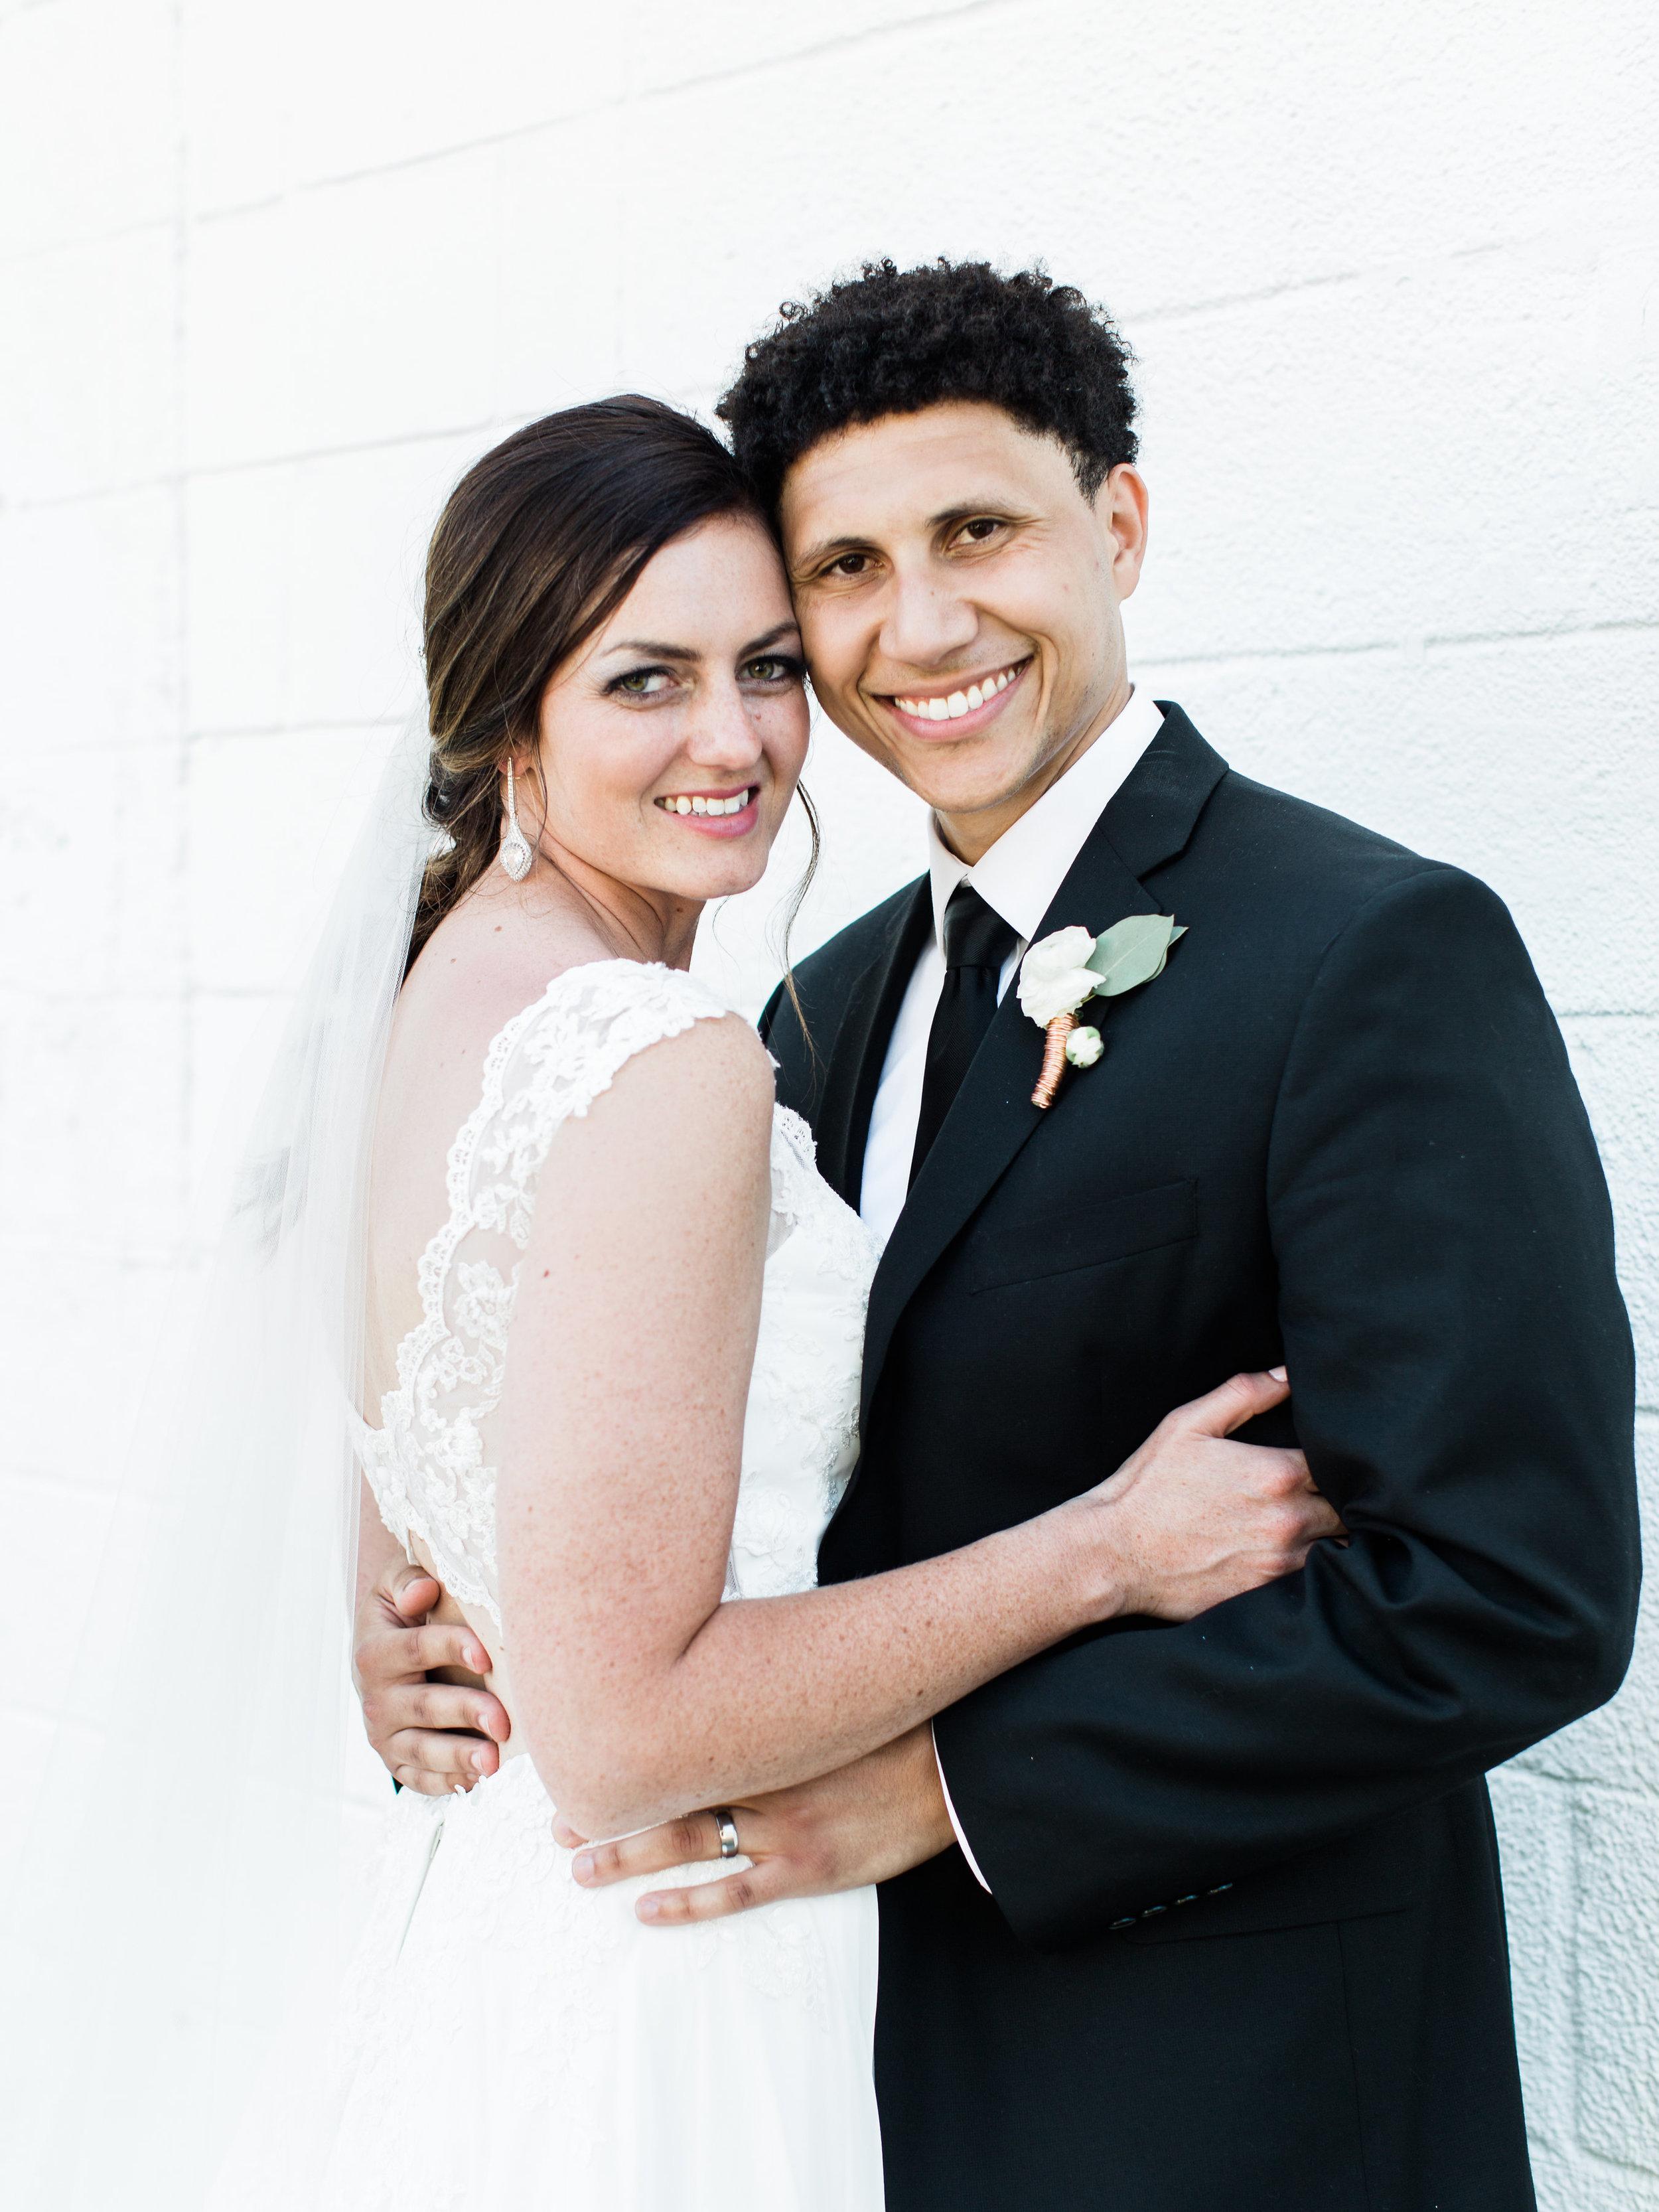 Julius+Wedding+BrideGroomb-28.jpg